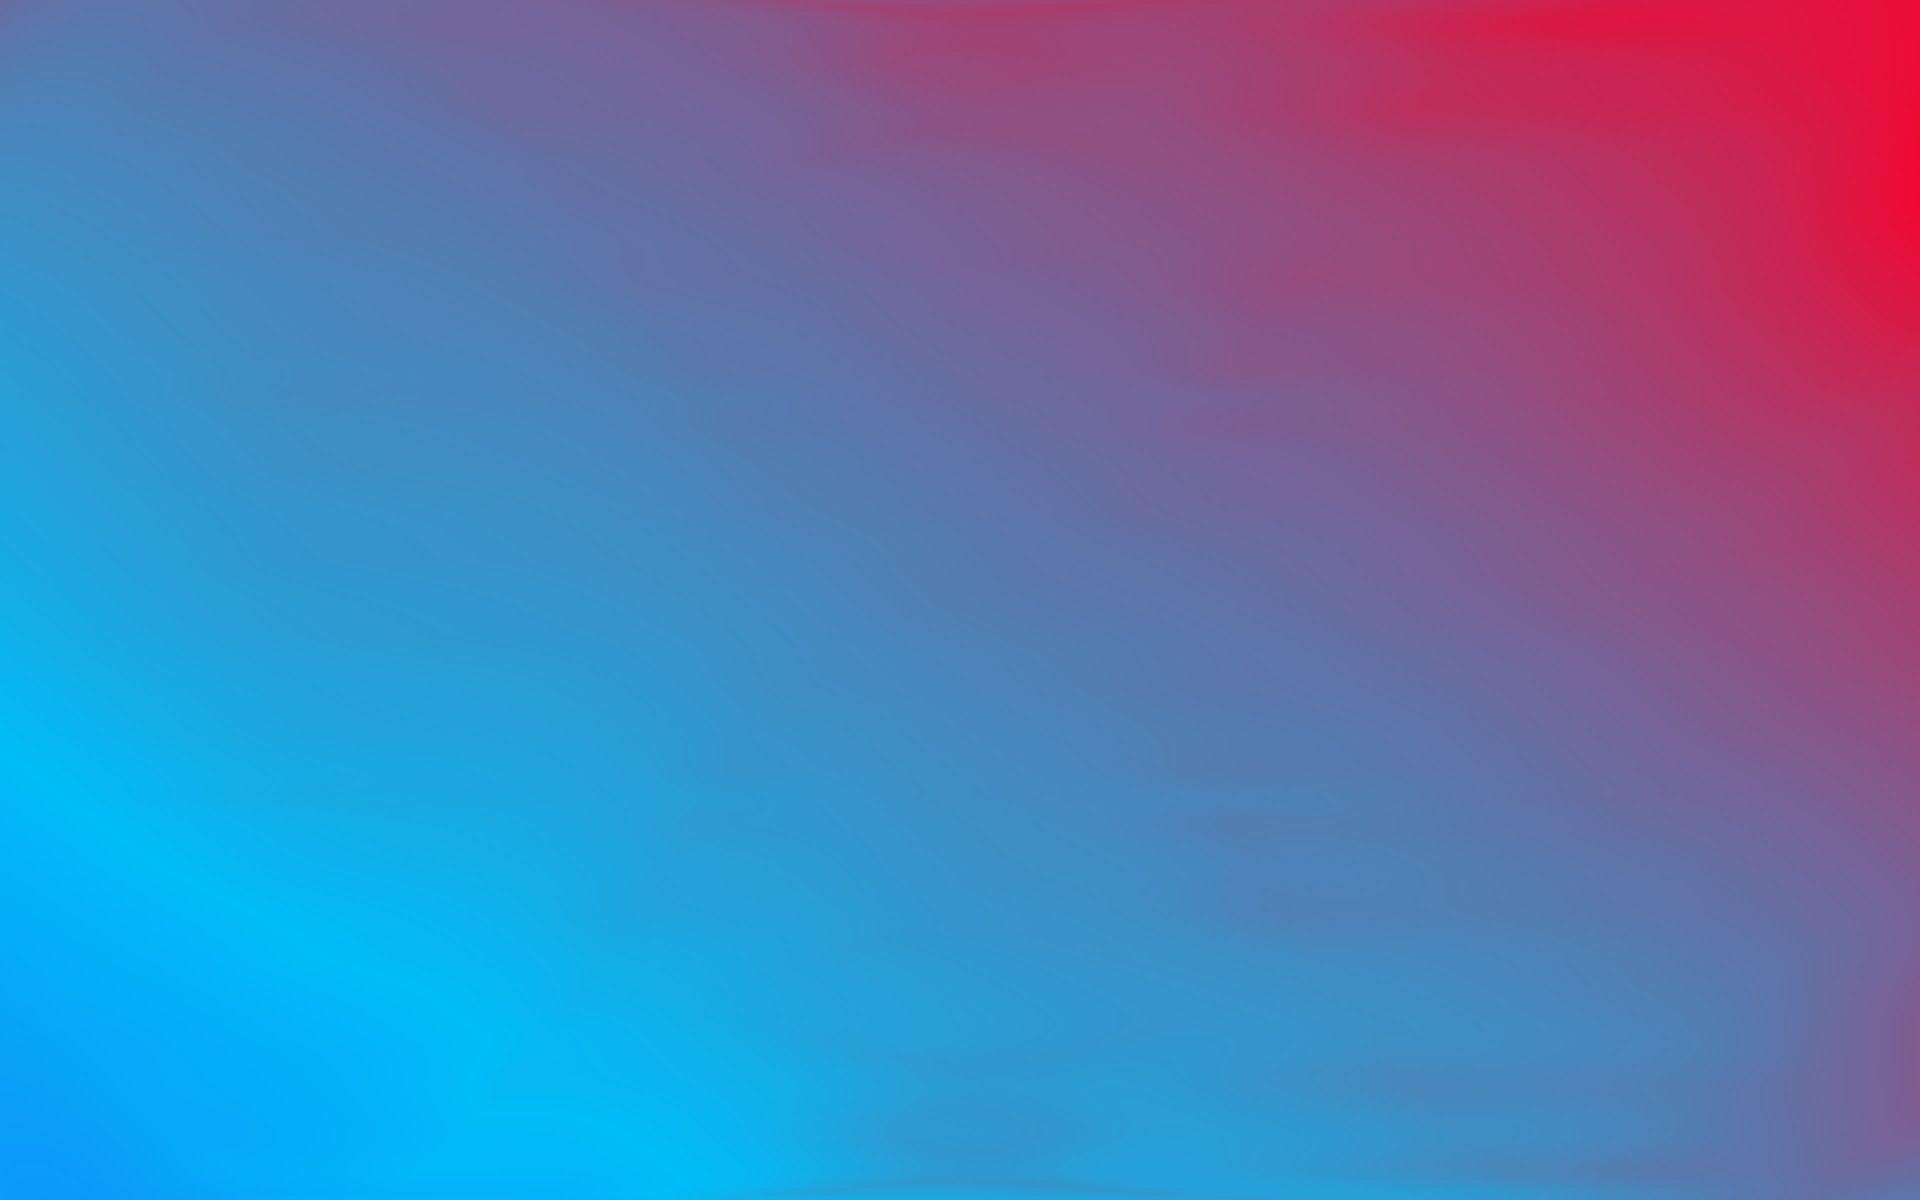 … wallpaper wiki; blue and purple background free download pixelstalk net  …